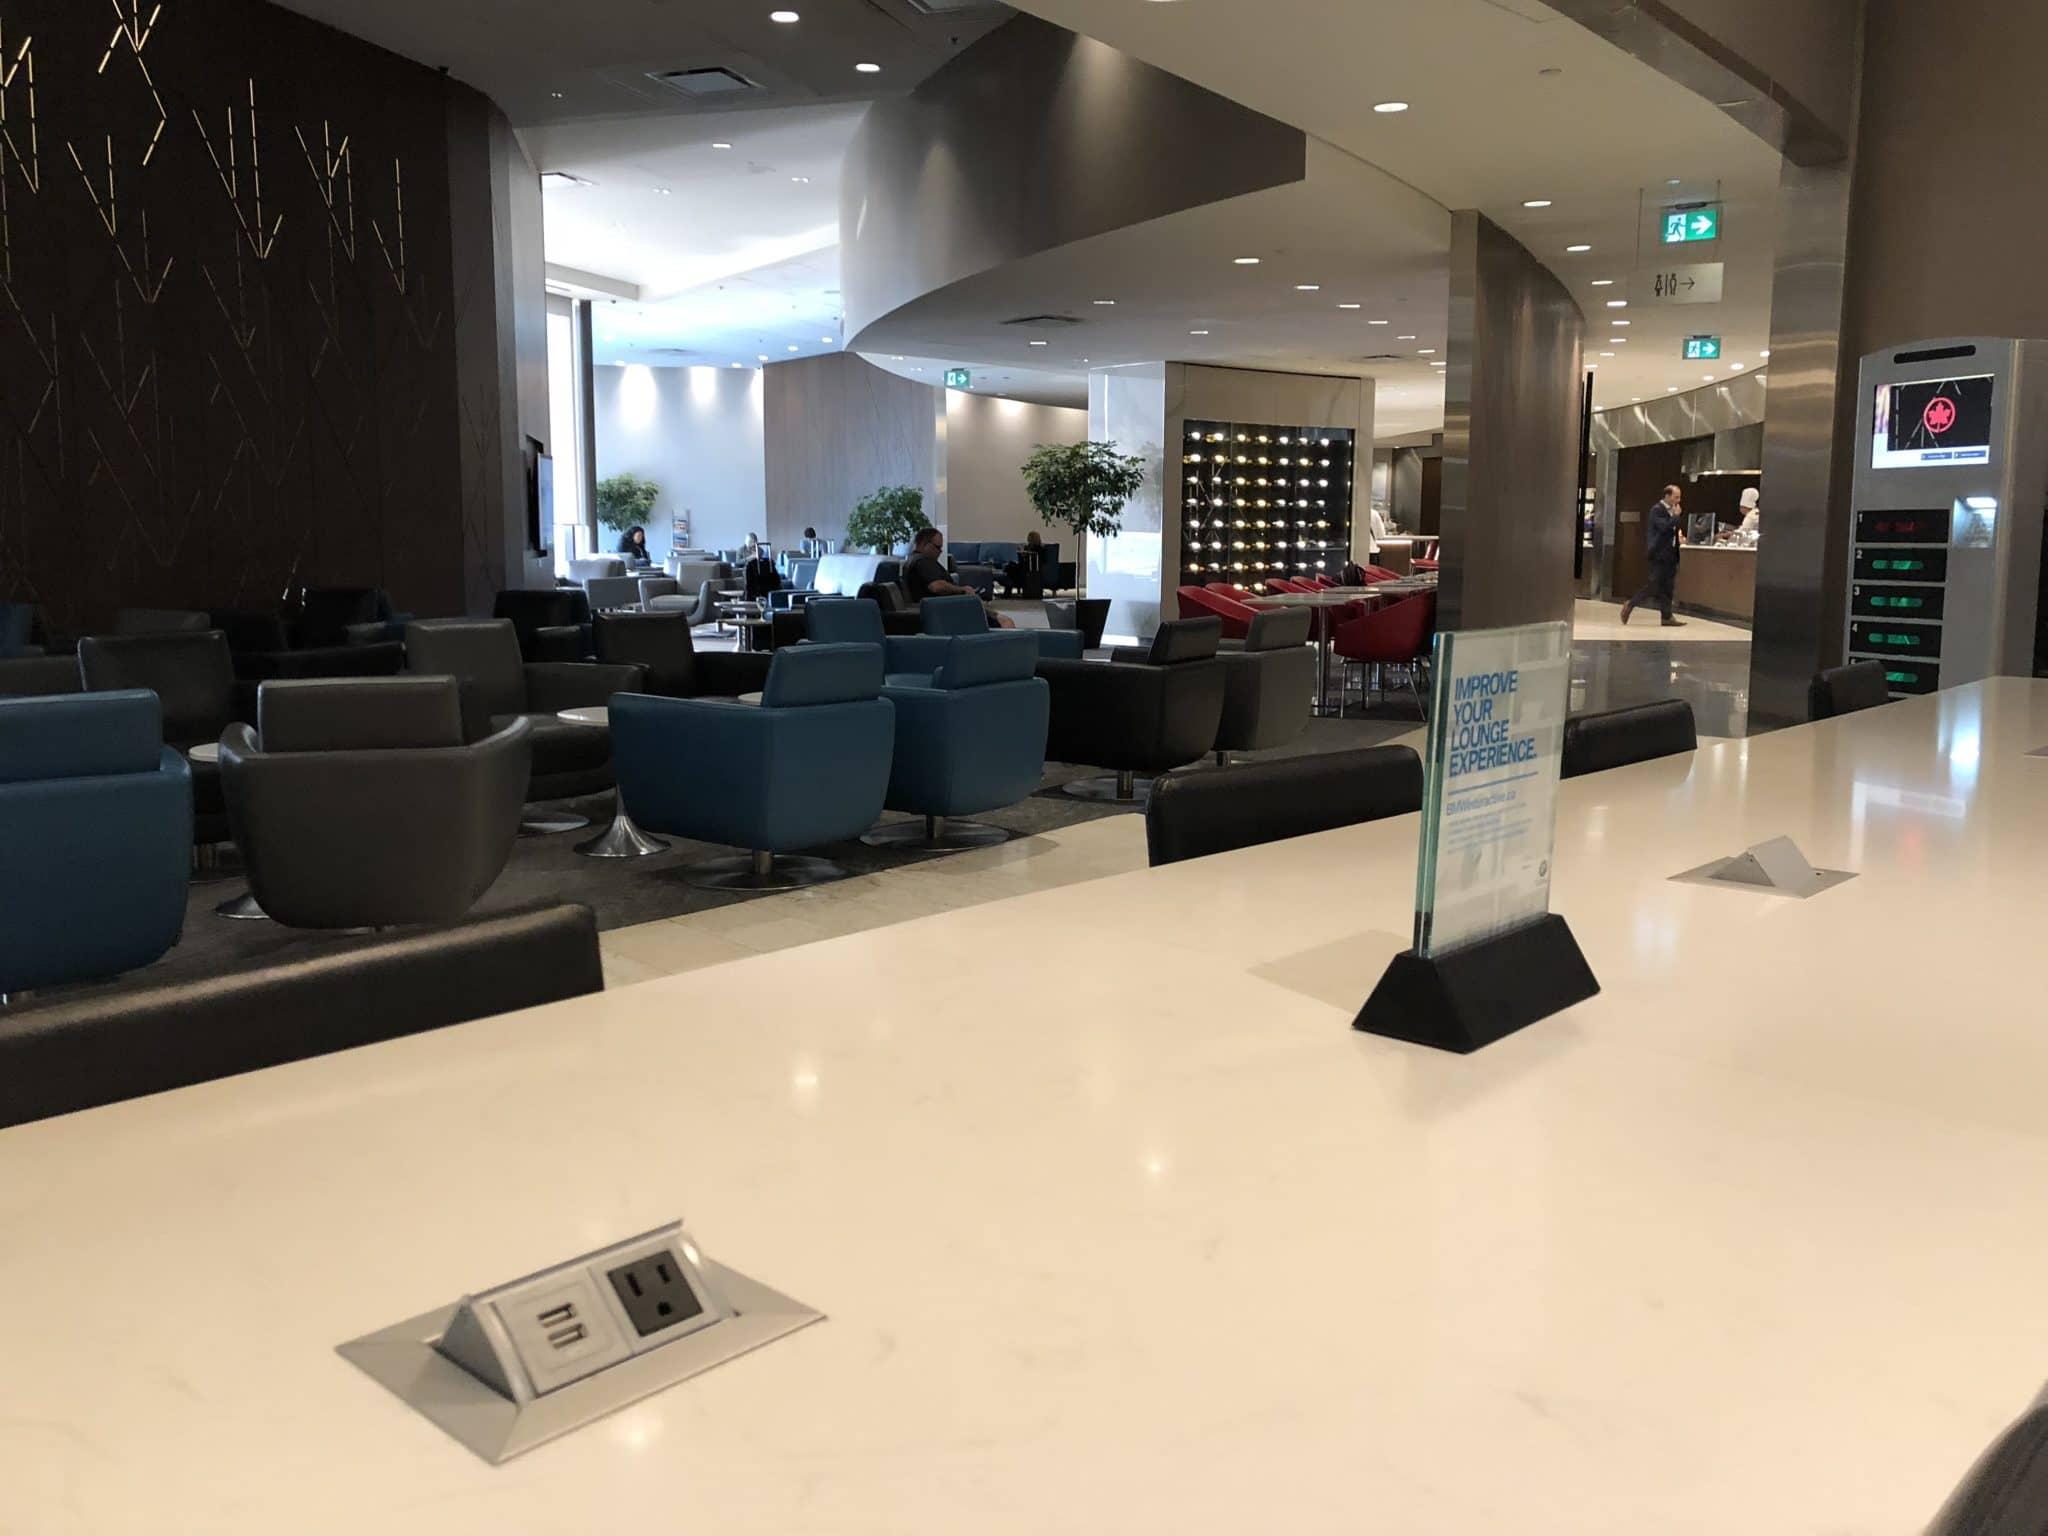 Air Canada Maple Leaf Lounge Calgary Blick in die Lounge